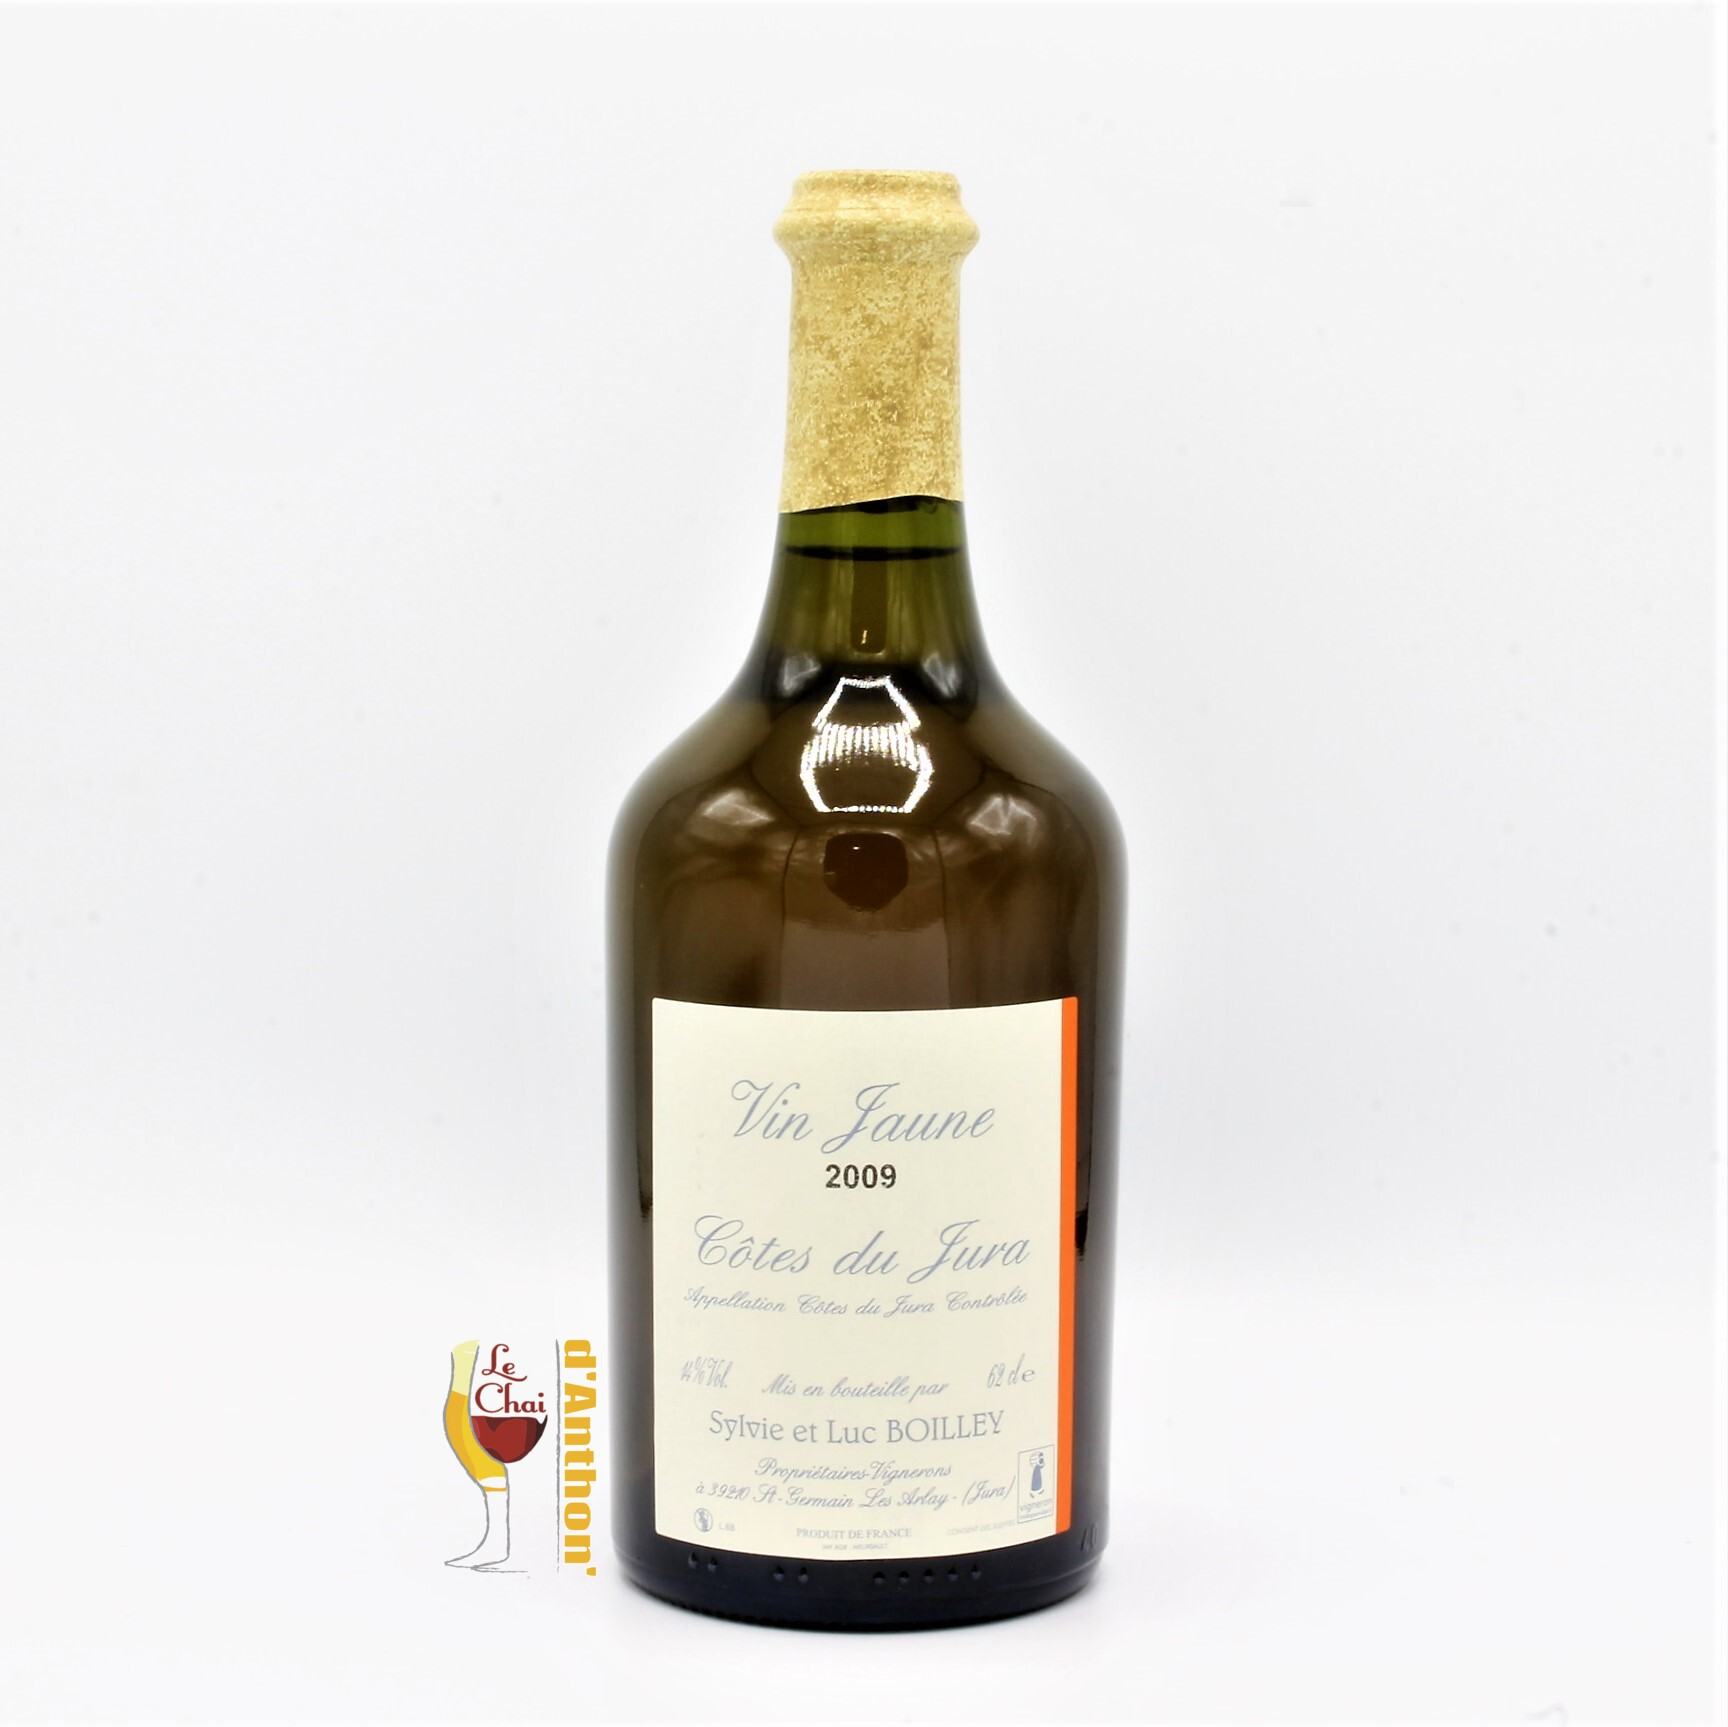 Vin Blanc Bouteille Jura Jaune Boilley 2009 62cl